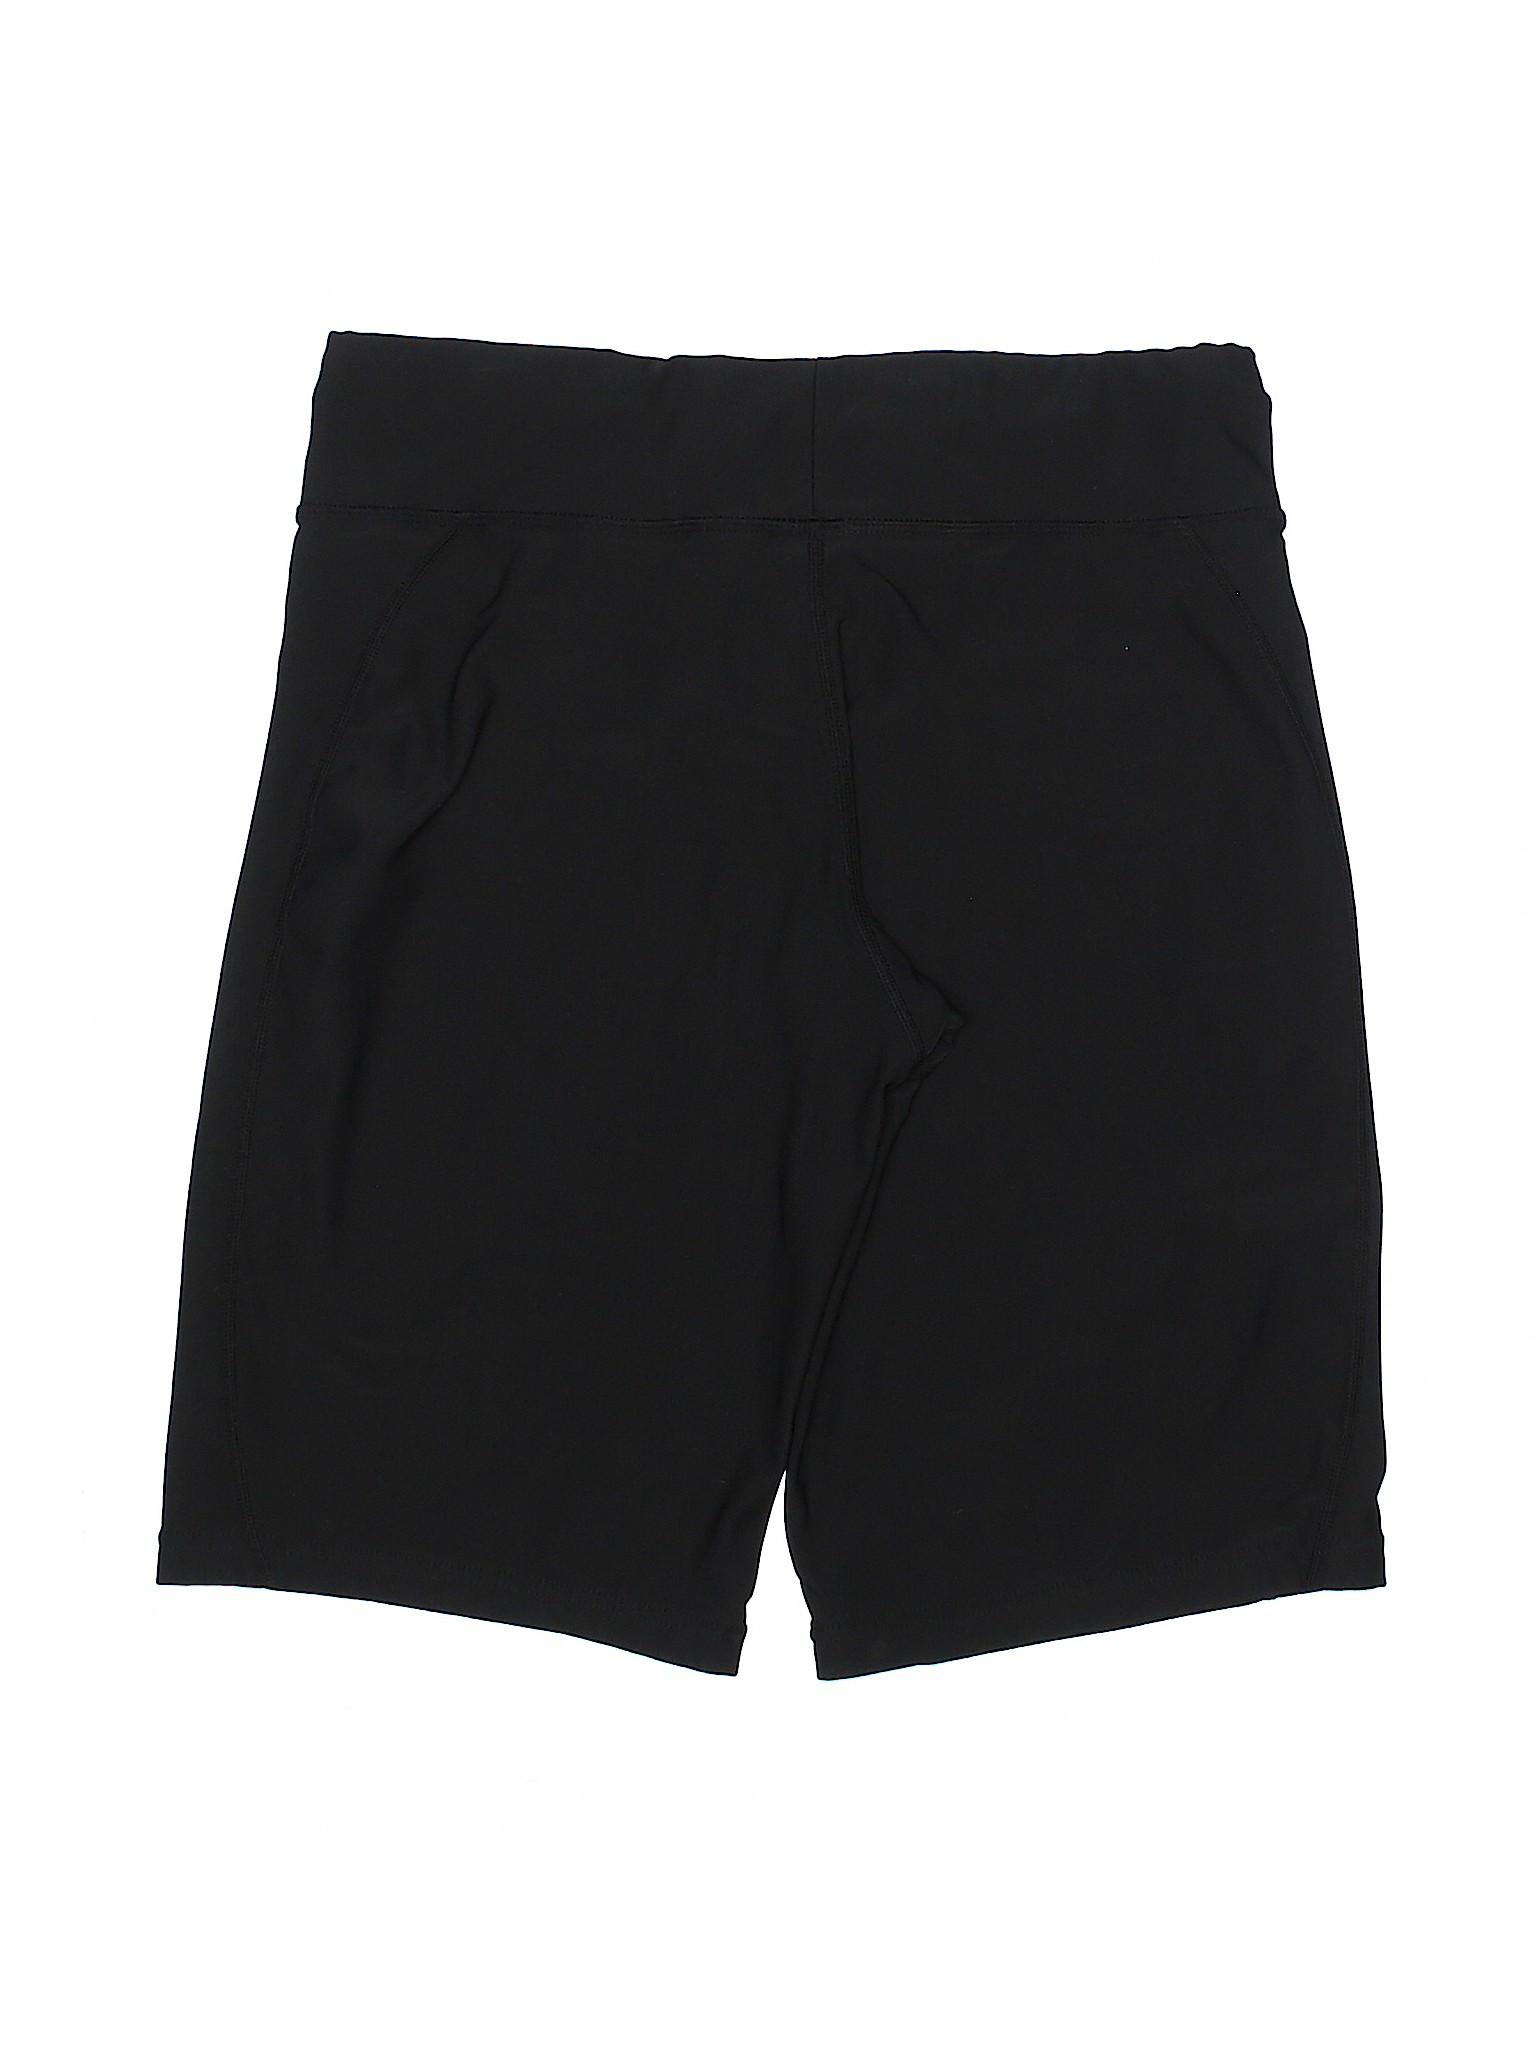 Nike Leisure Athletic Shorts Leisure winter winter YaCwYq